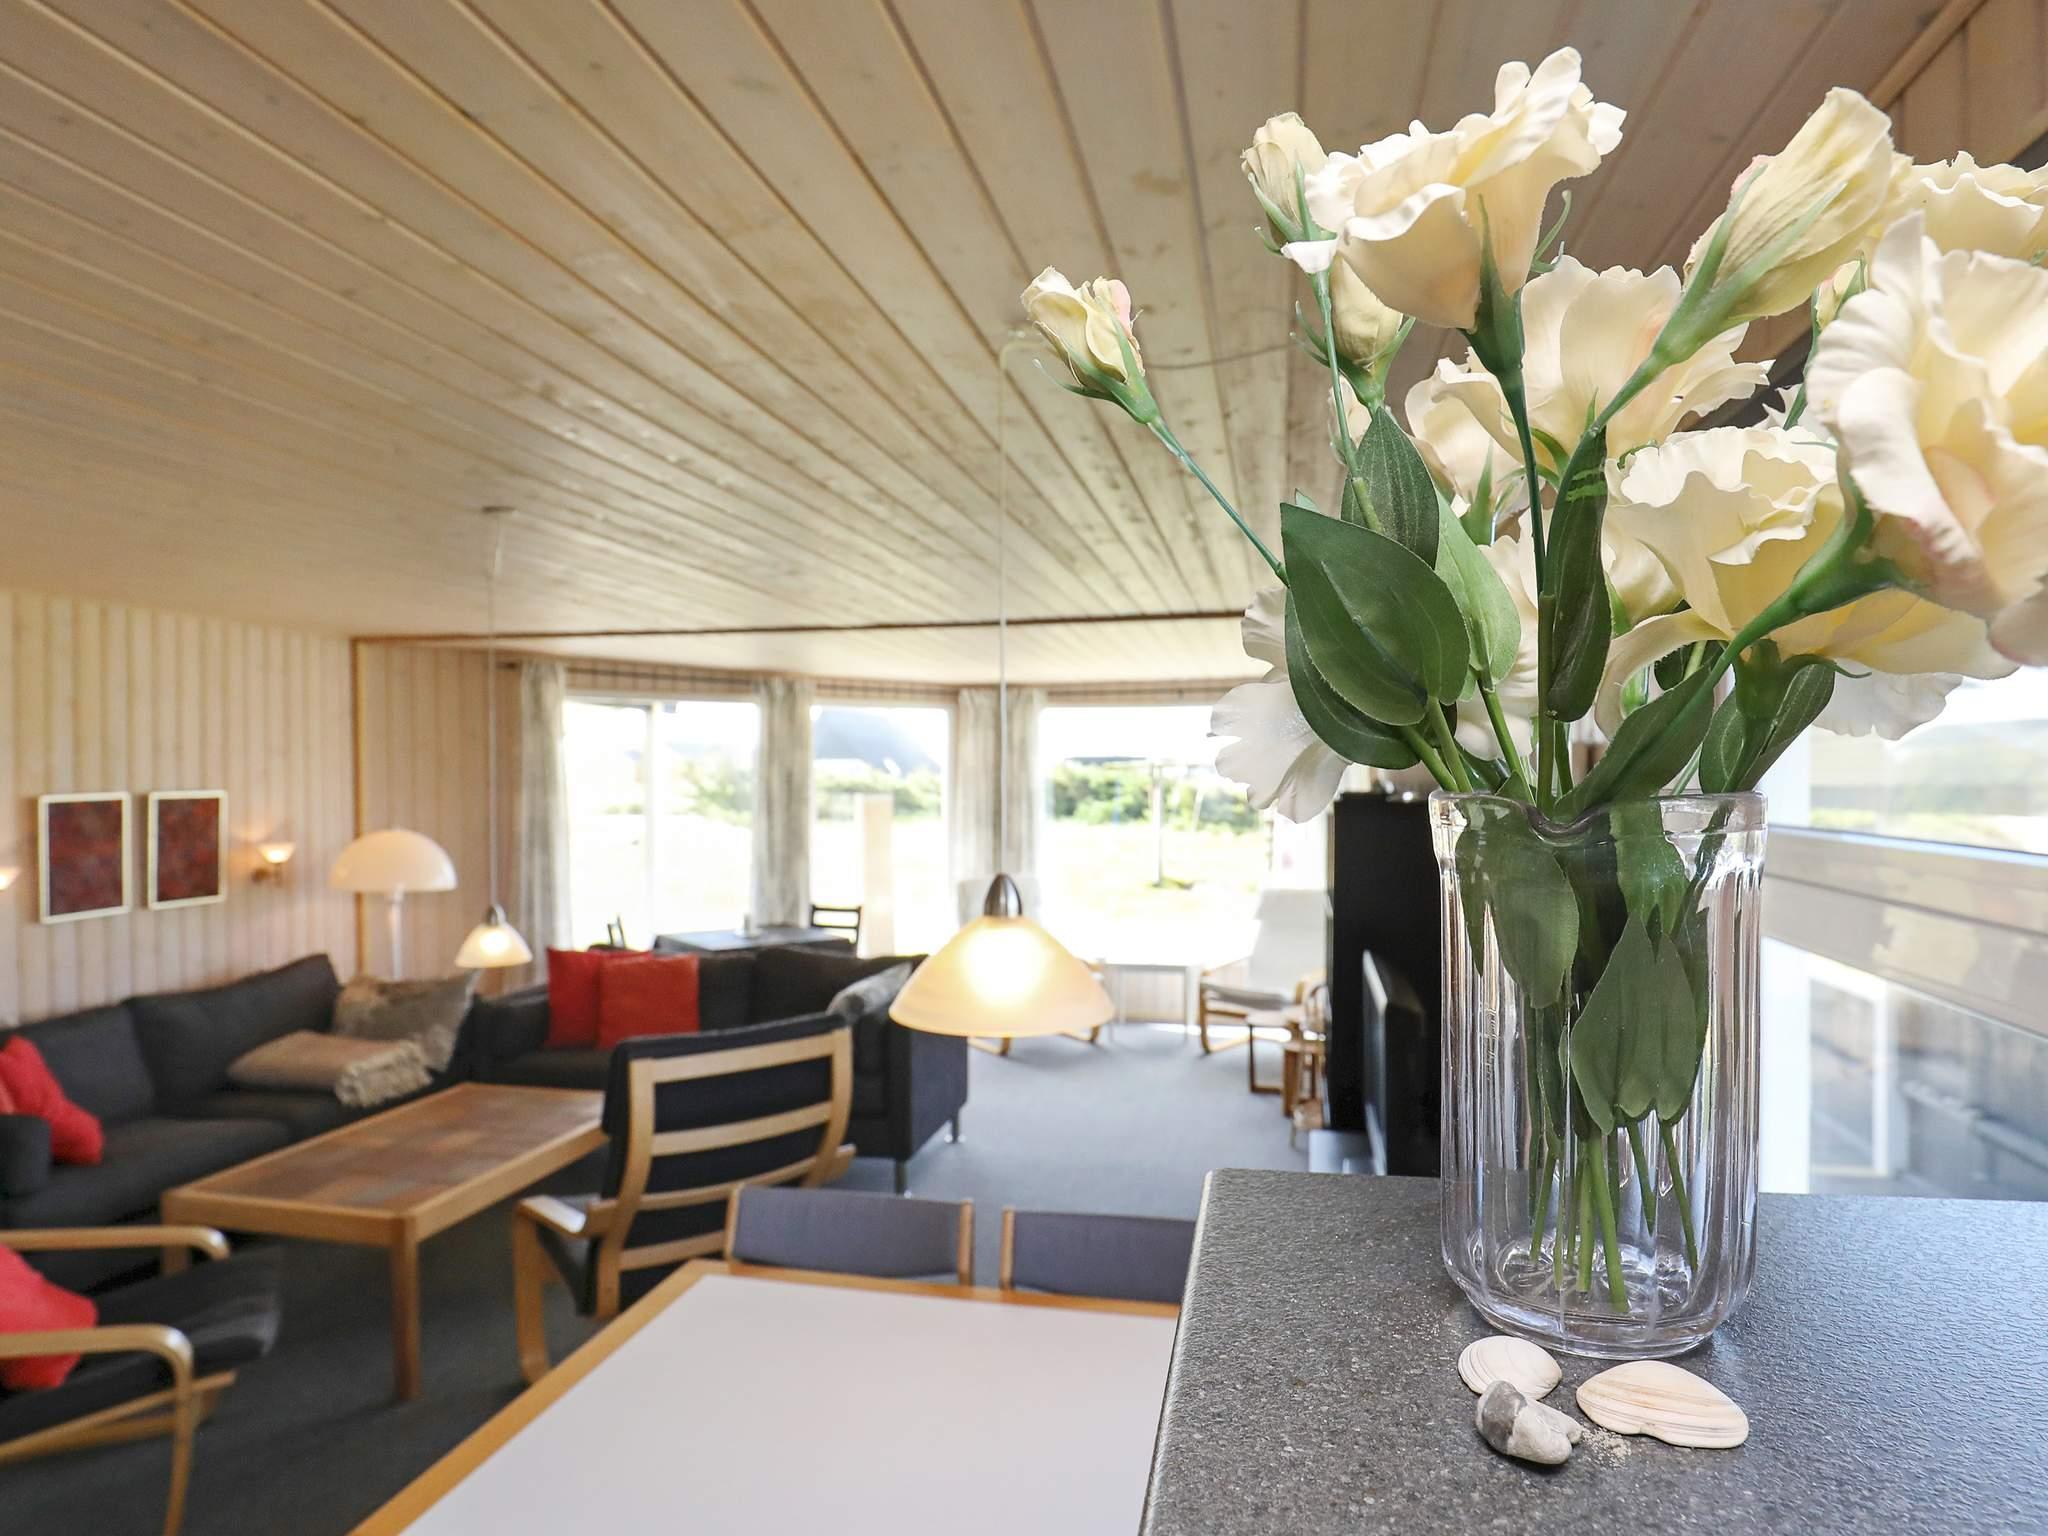 Ferienhaus Vrist (81919), Vrist, , Limfjord, Dänemark, Bild 2